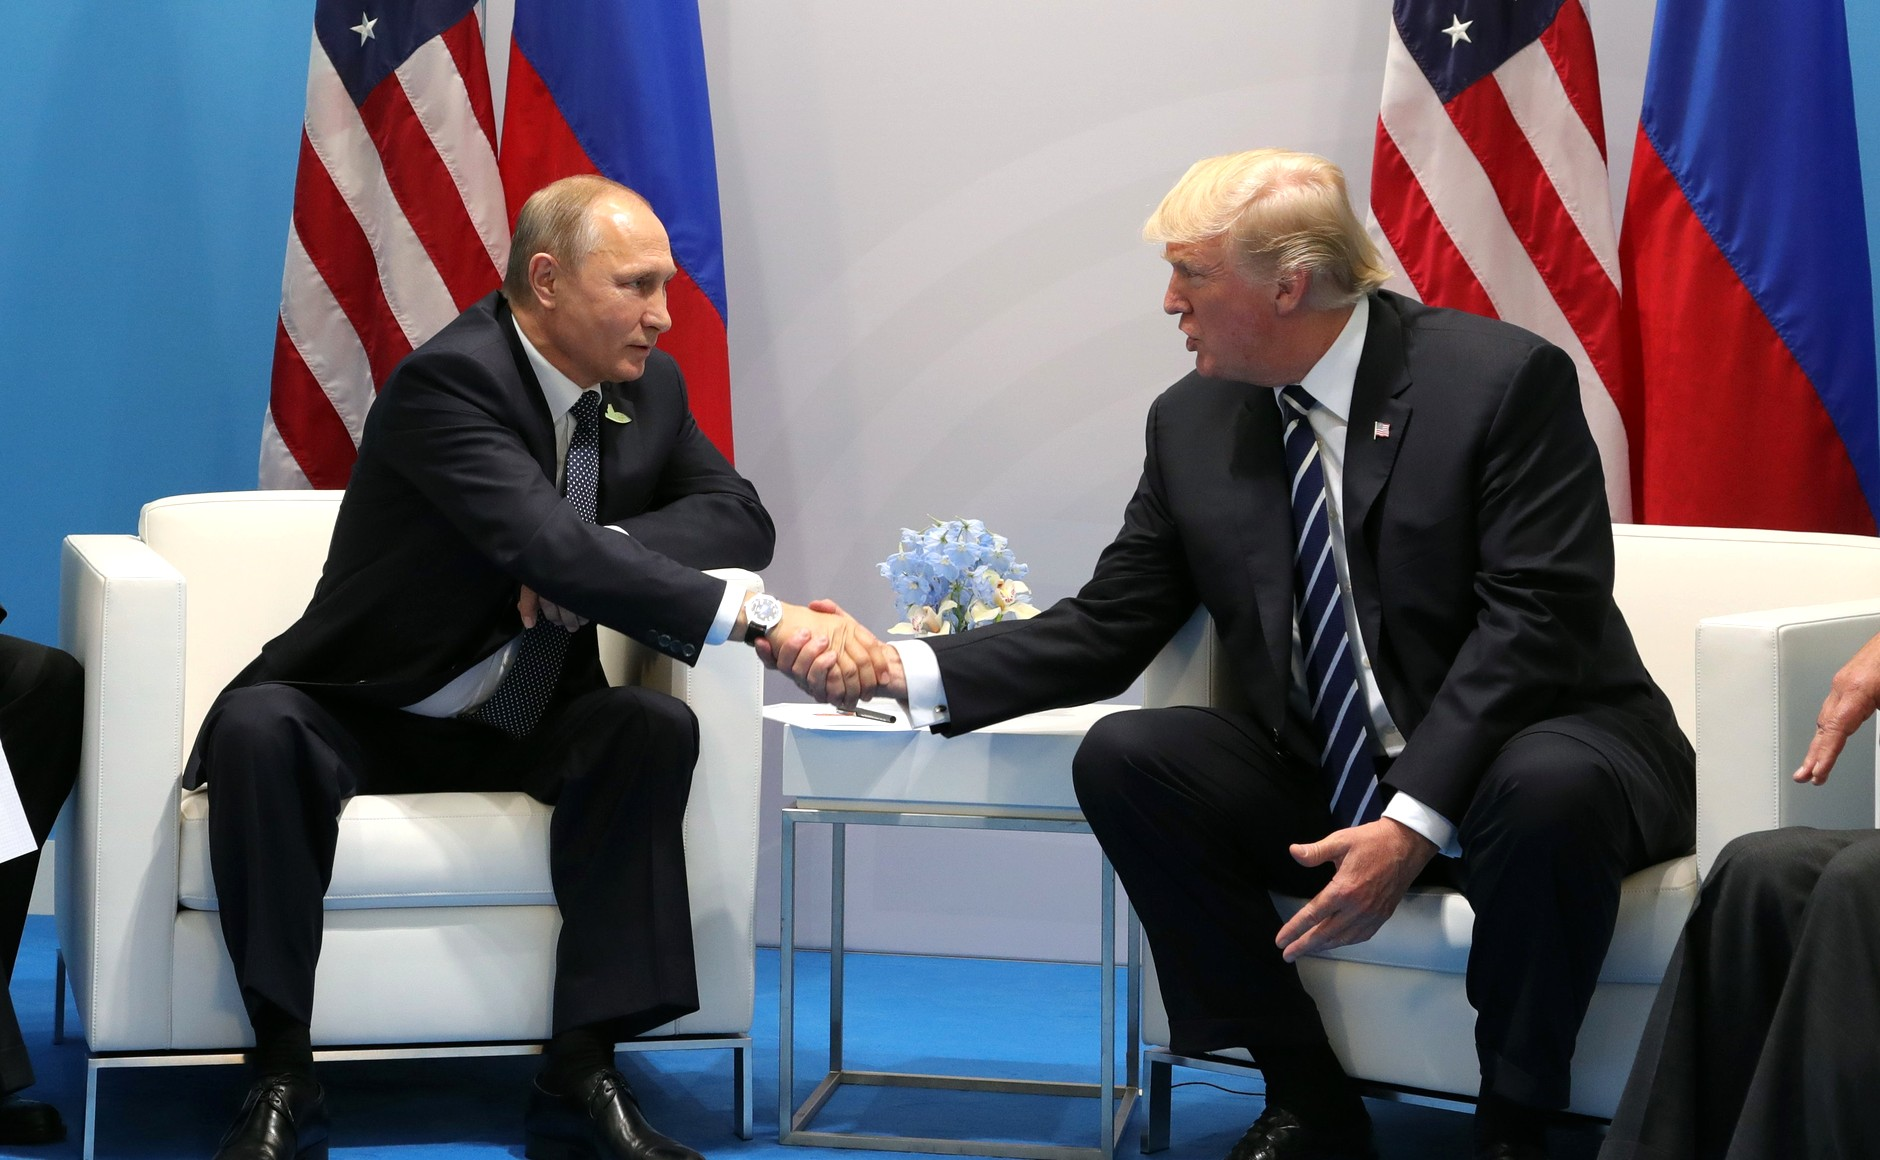 Vladimir_Putin_and_Donald_Trump_at_the_2017_G-20_Hamburg_Summit_(2).jpg